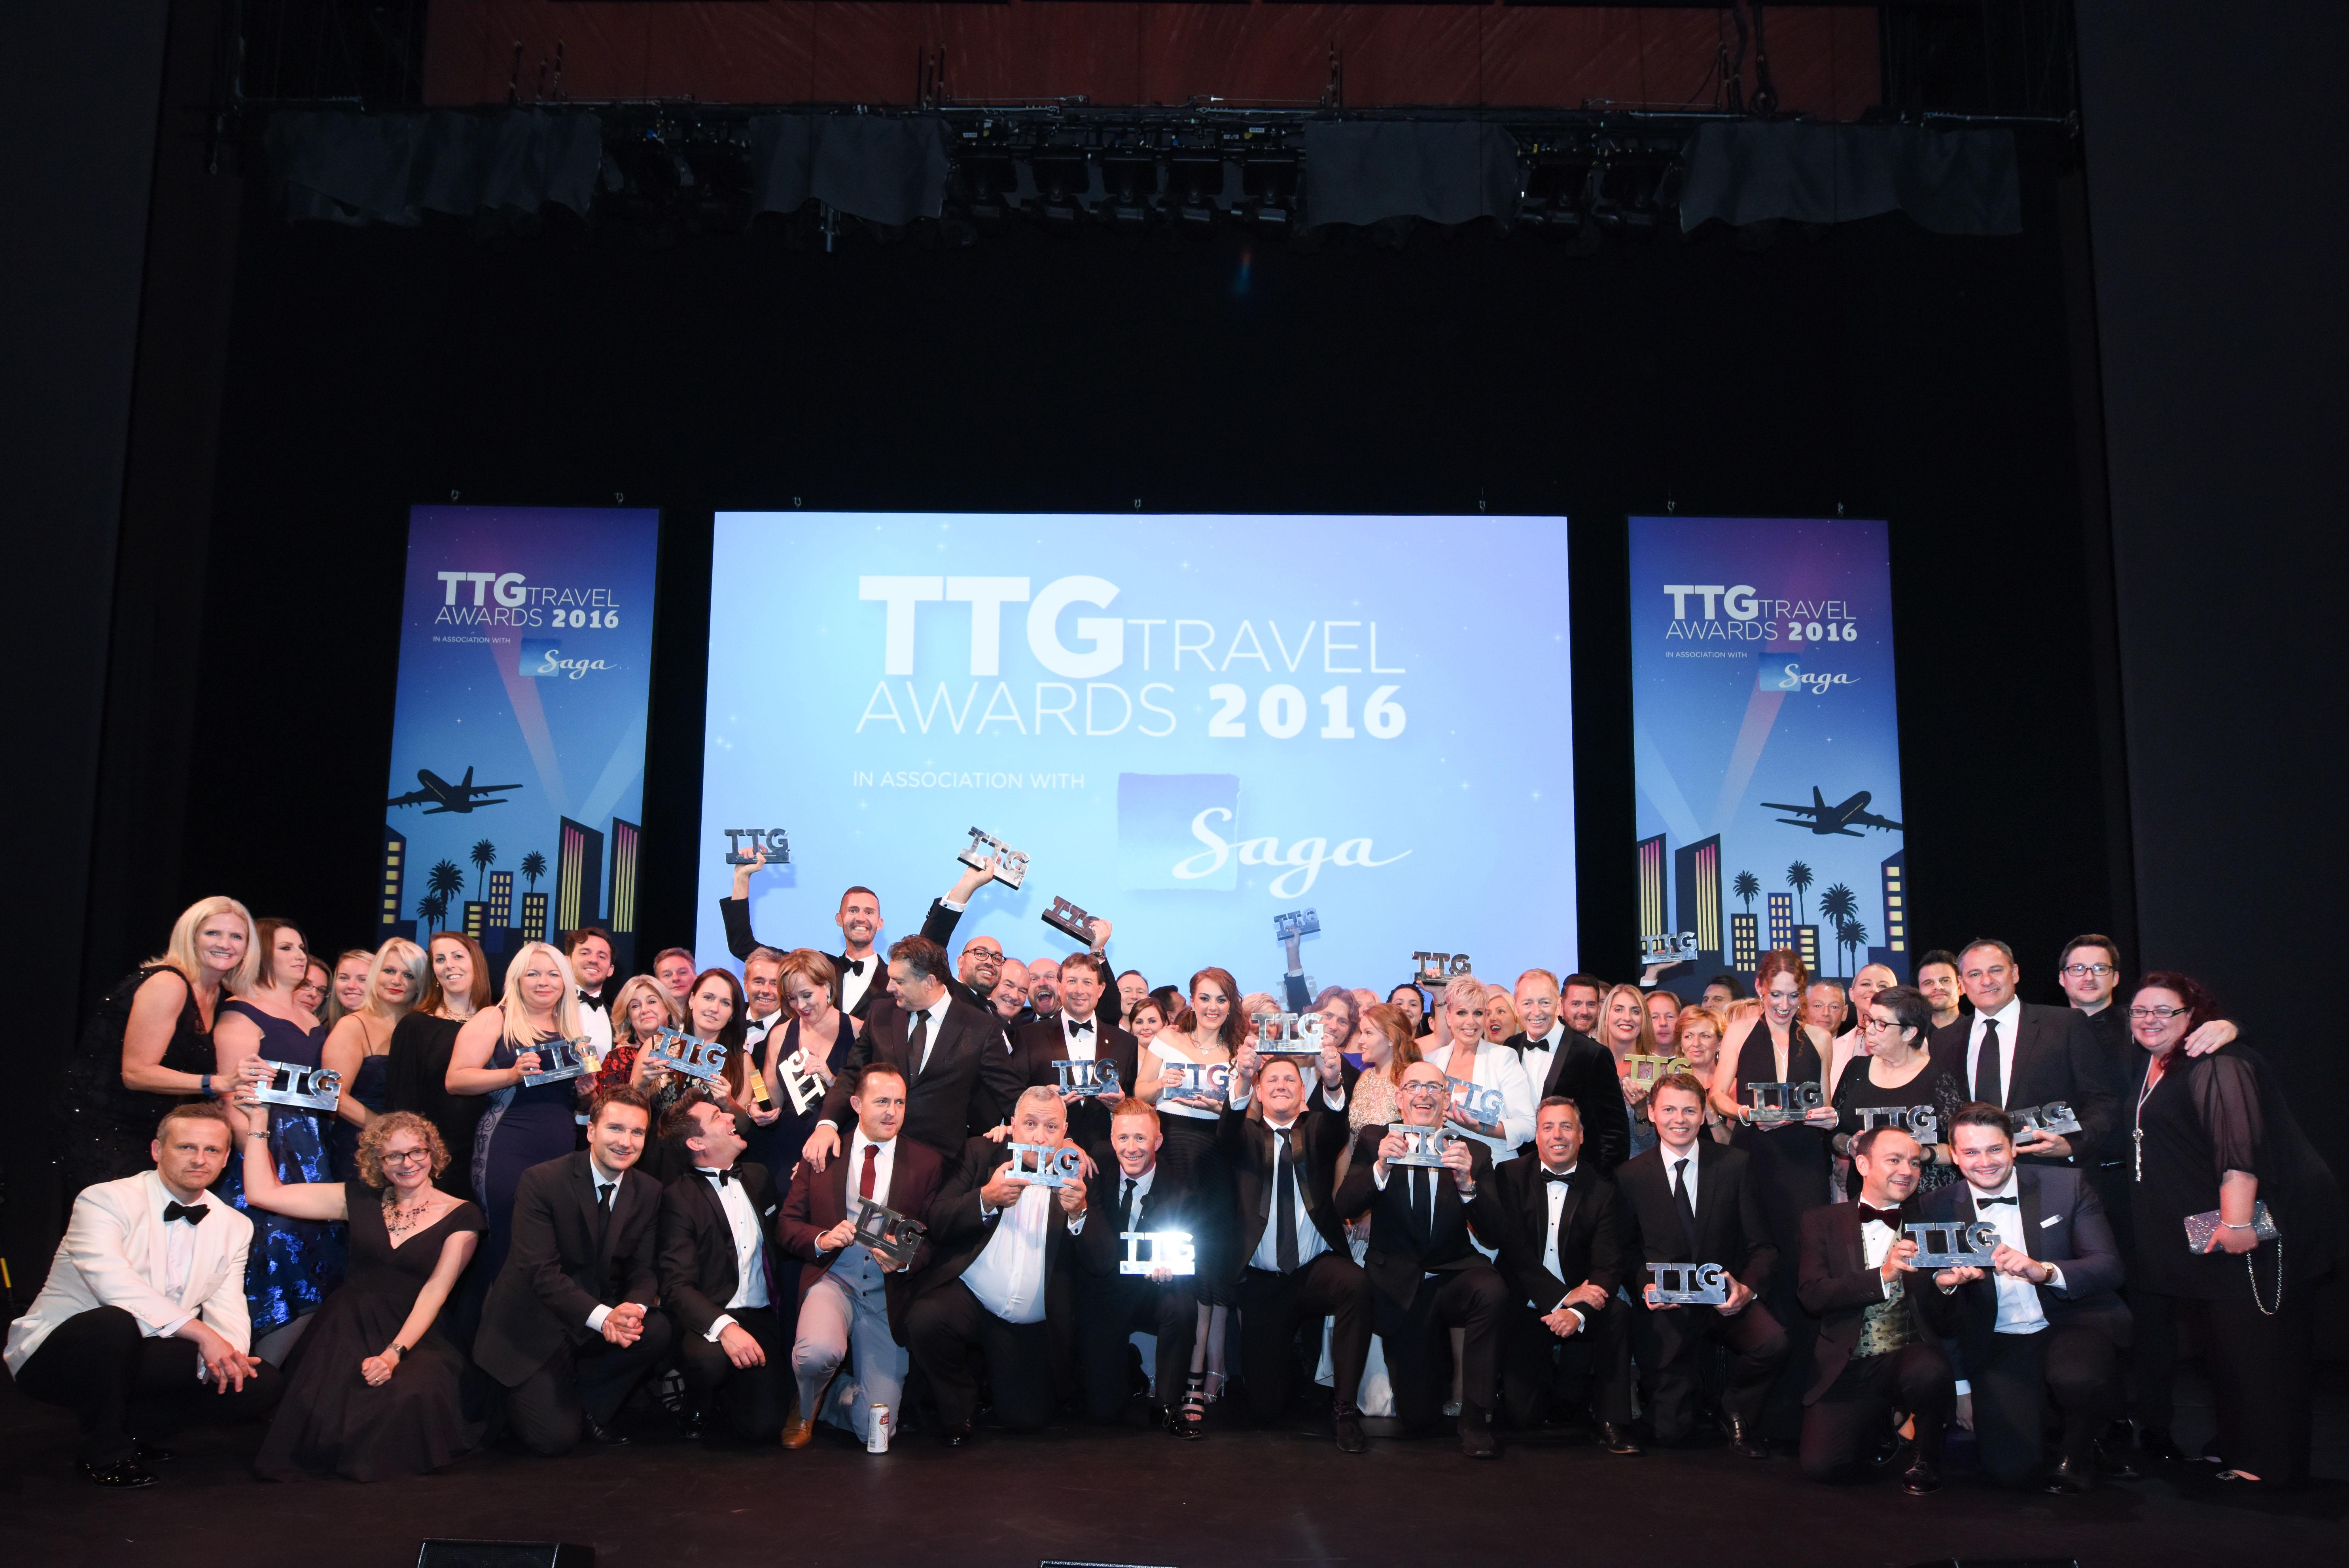 160919-214029-TTG_Travel_Awards_2016-Edit.jpg1